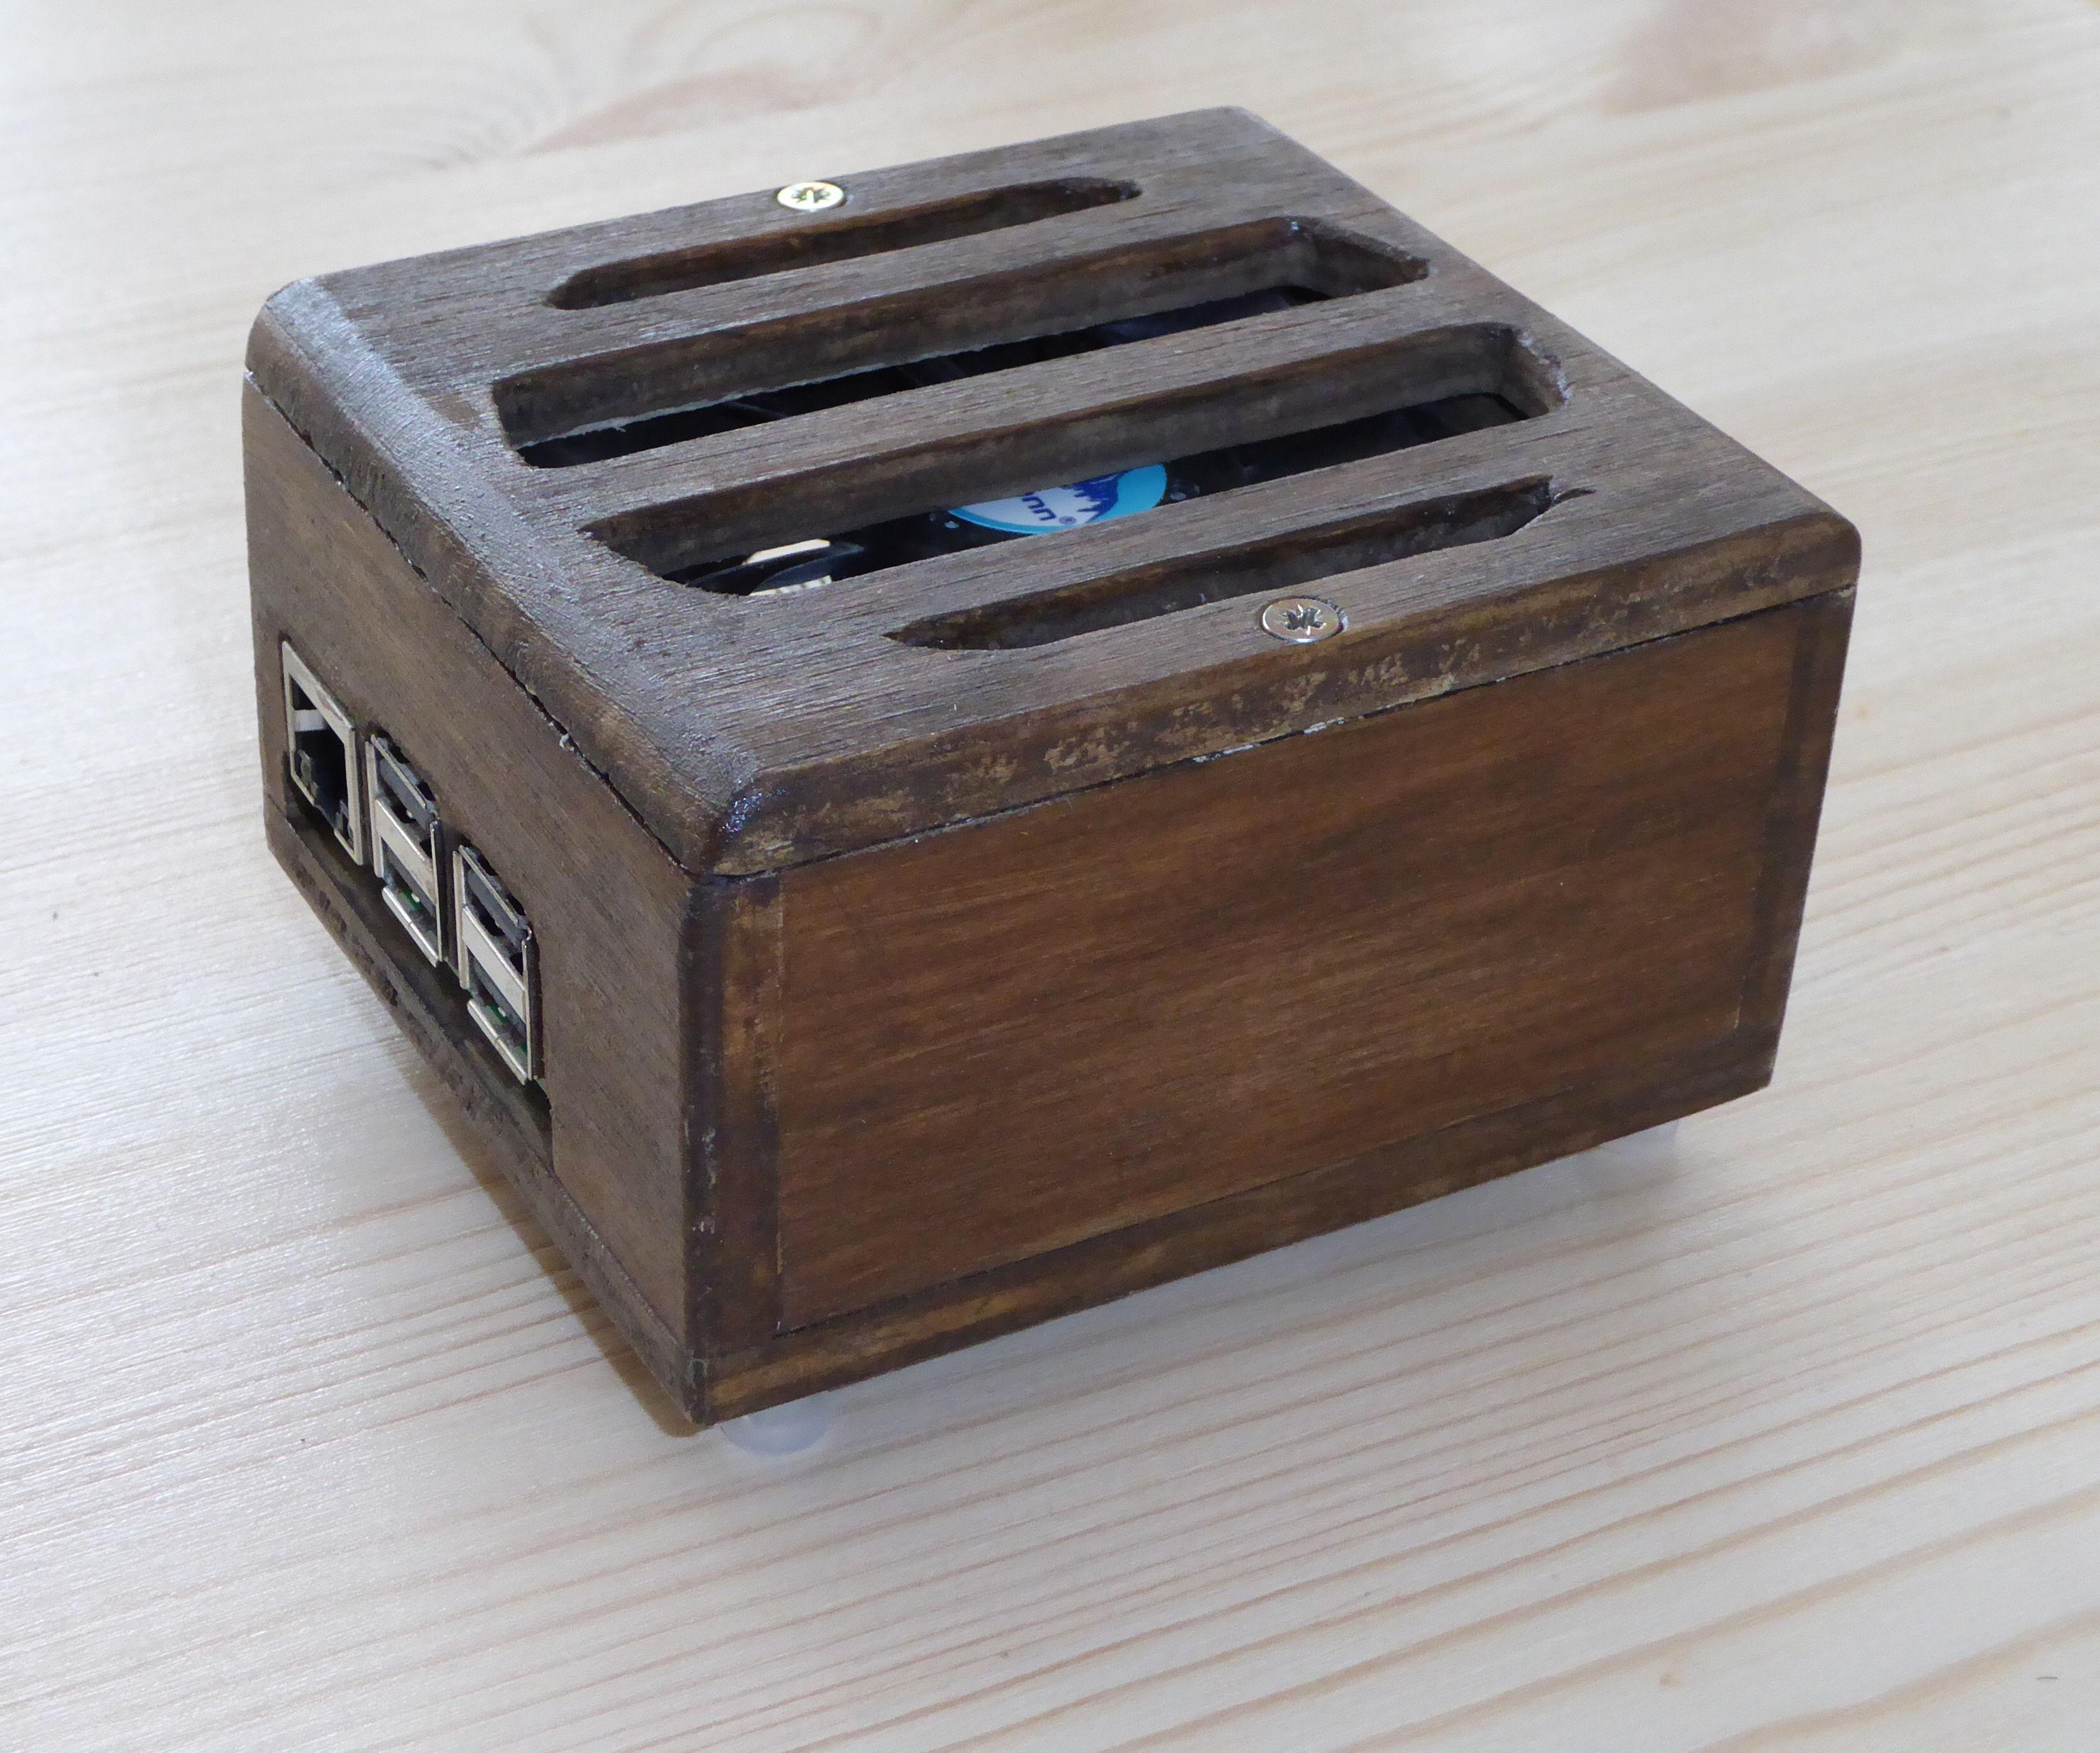 Plywood Raspberry Pi box with fan